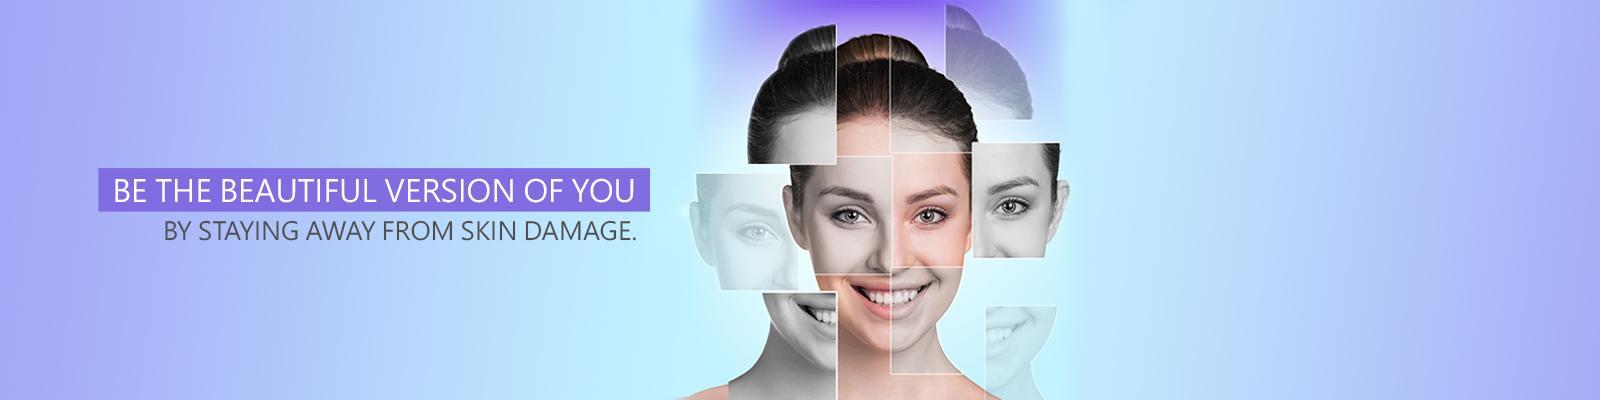 Dermatologist Skin Care Specialist Skin Specialist